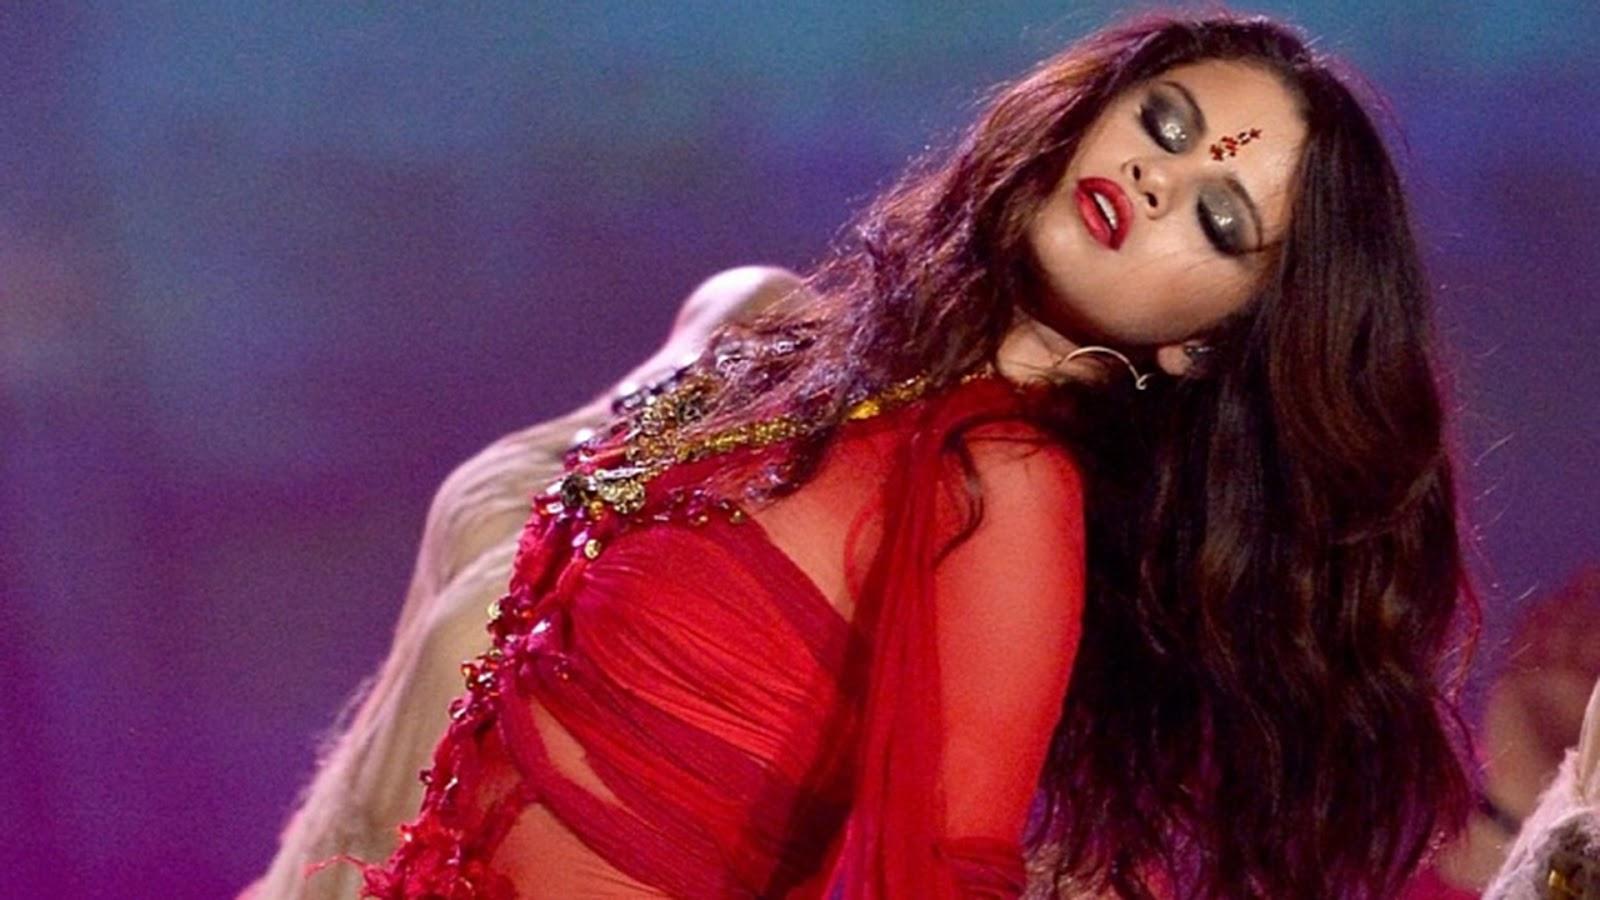 http://4.bp.blogspot.com/-iMlVx6Om2v8/UYAsLeLXXMI/AAAAAAAADZs/Uk43jCIJ2xU/s1600/MTV-Movie-Awards-2013-Selena-Gomez-Performs-Come-Get-It.jpg